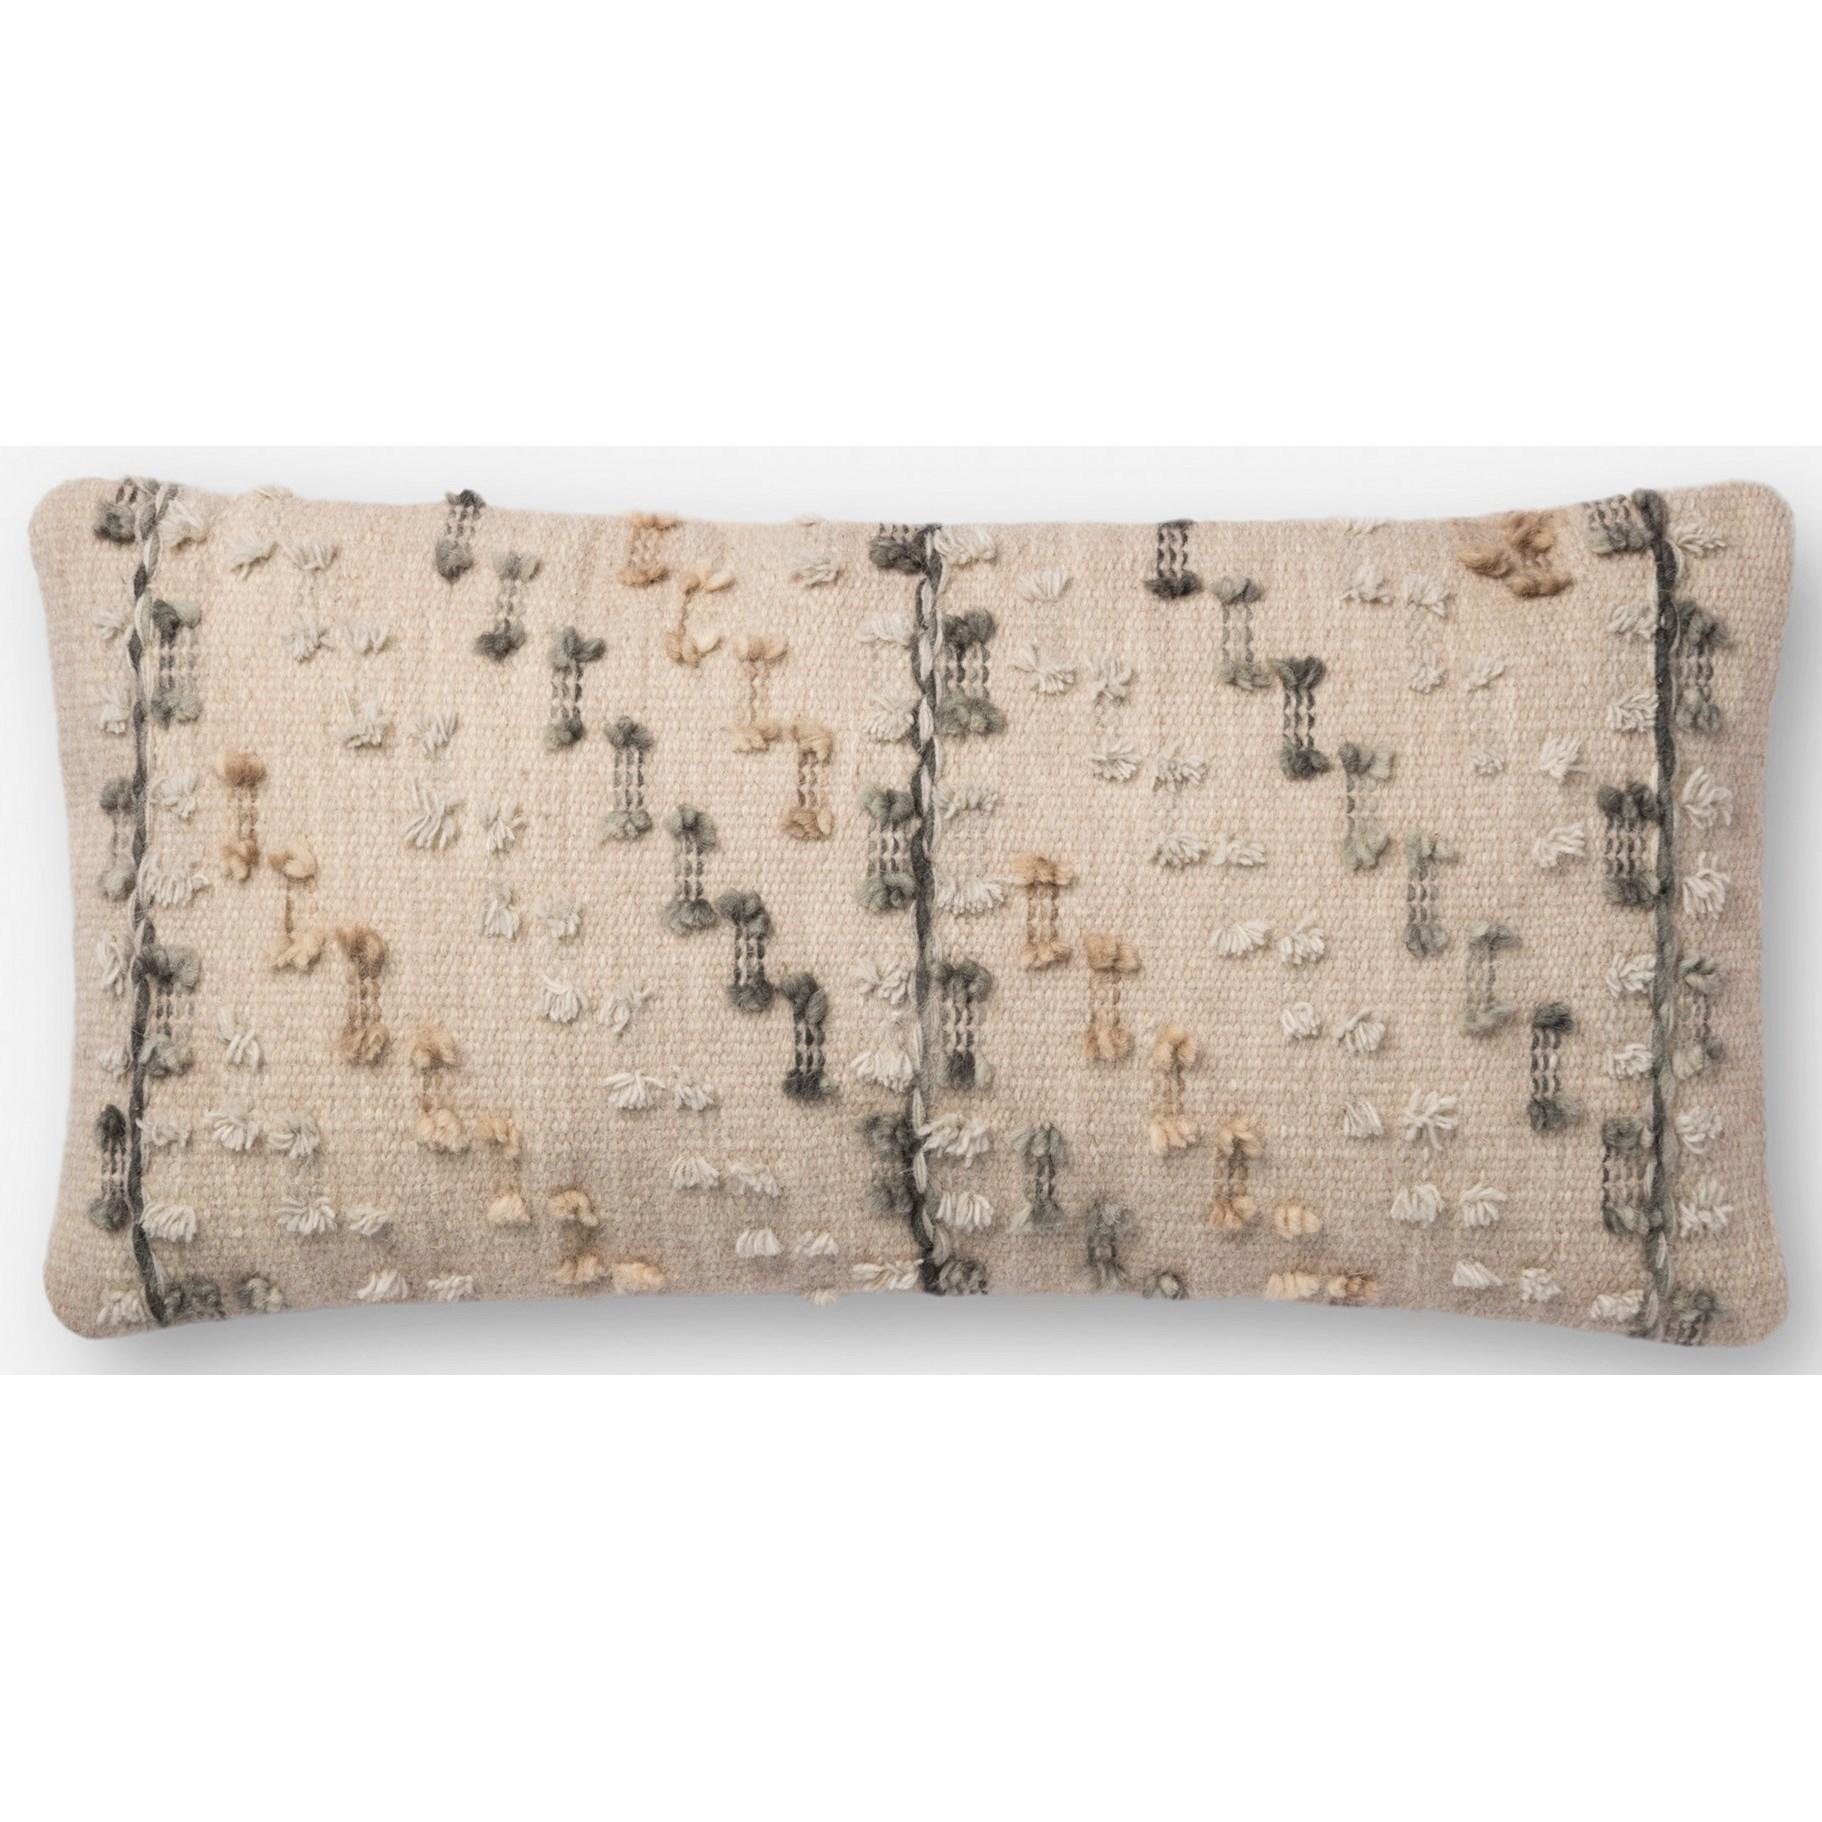 "12"" x 27"" Polyester Pillow"